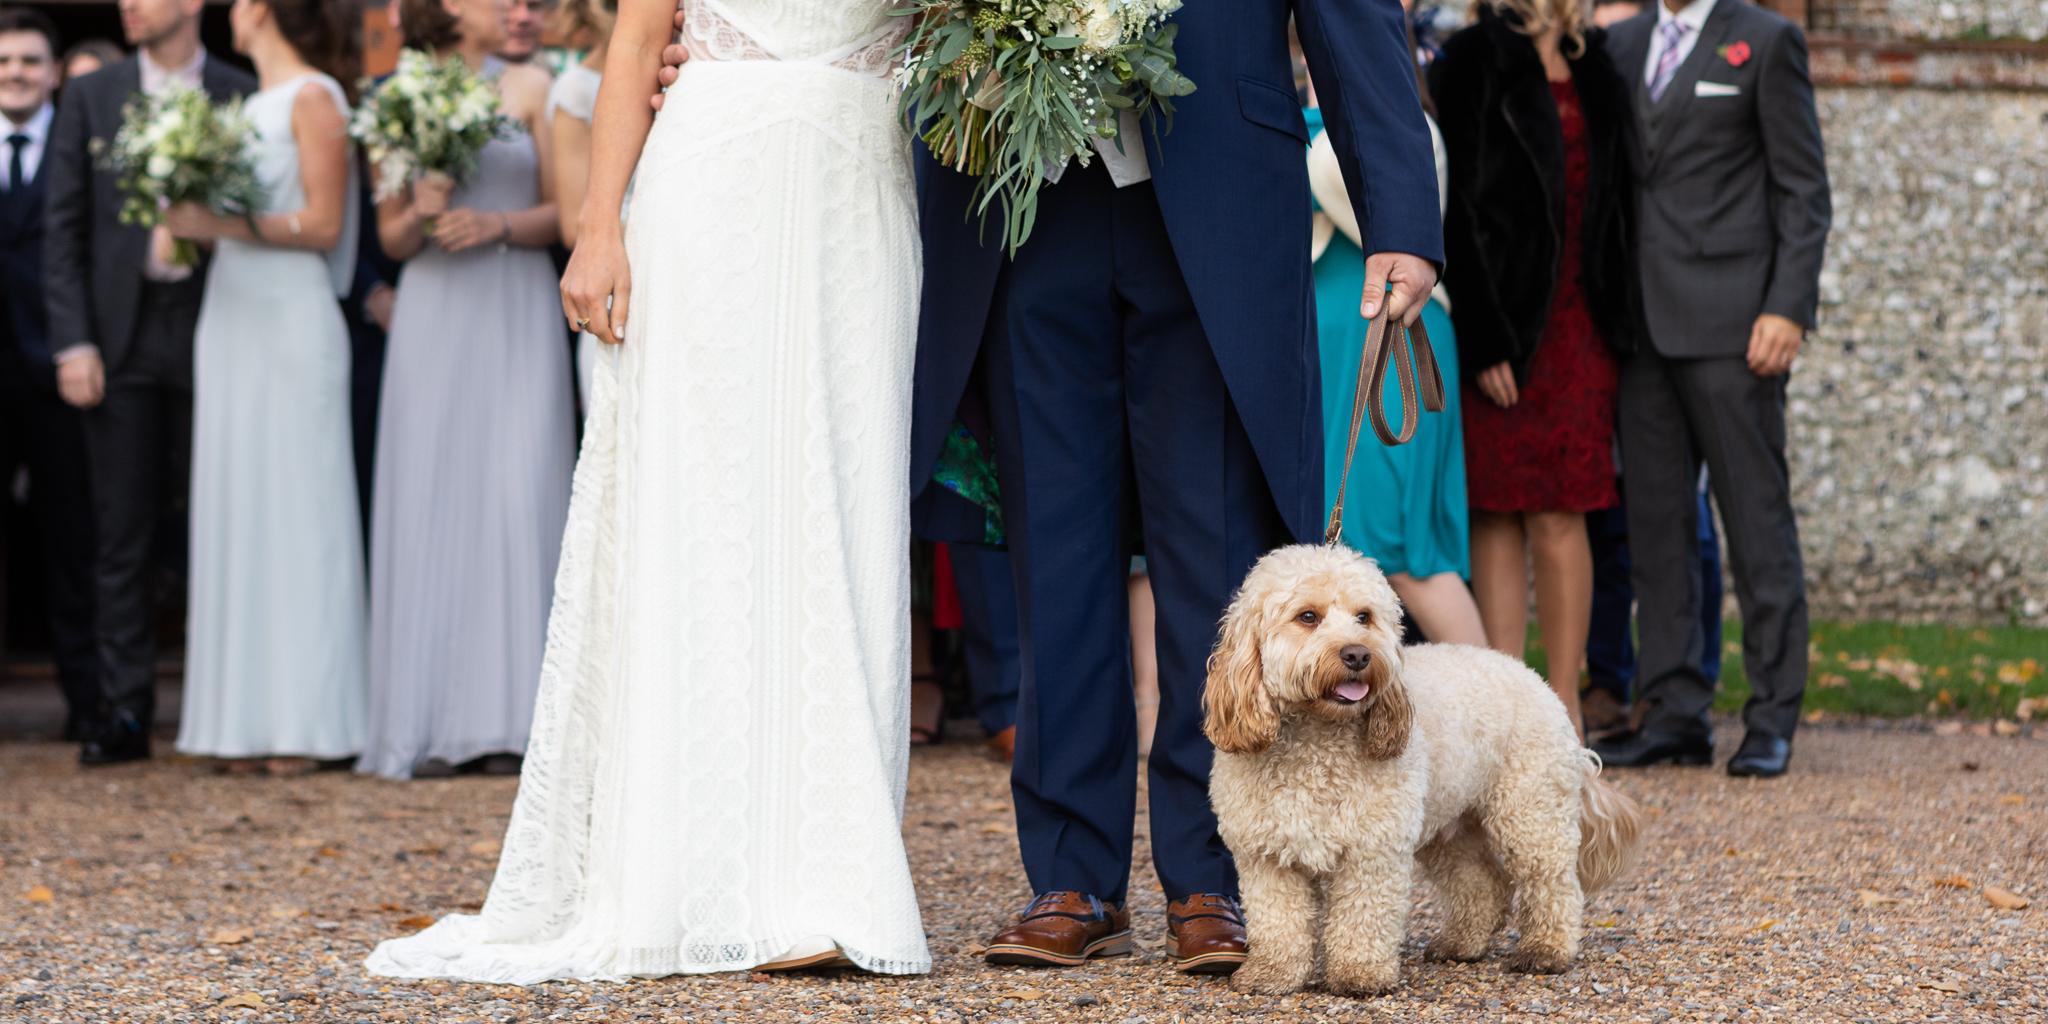 Fur_Baby_Hampshire_natural_wedding_photography_Rachel_Thornhill_Photographer